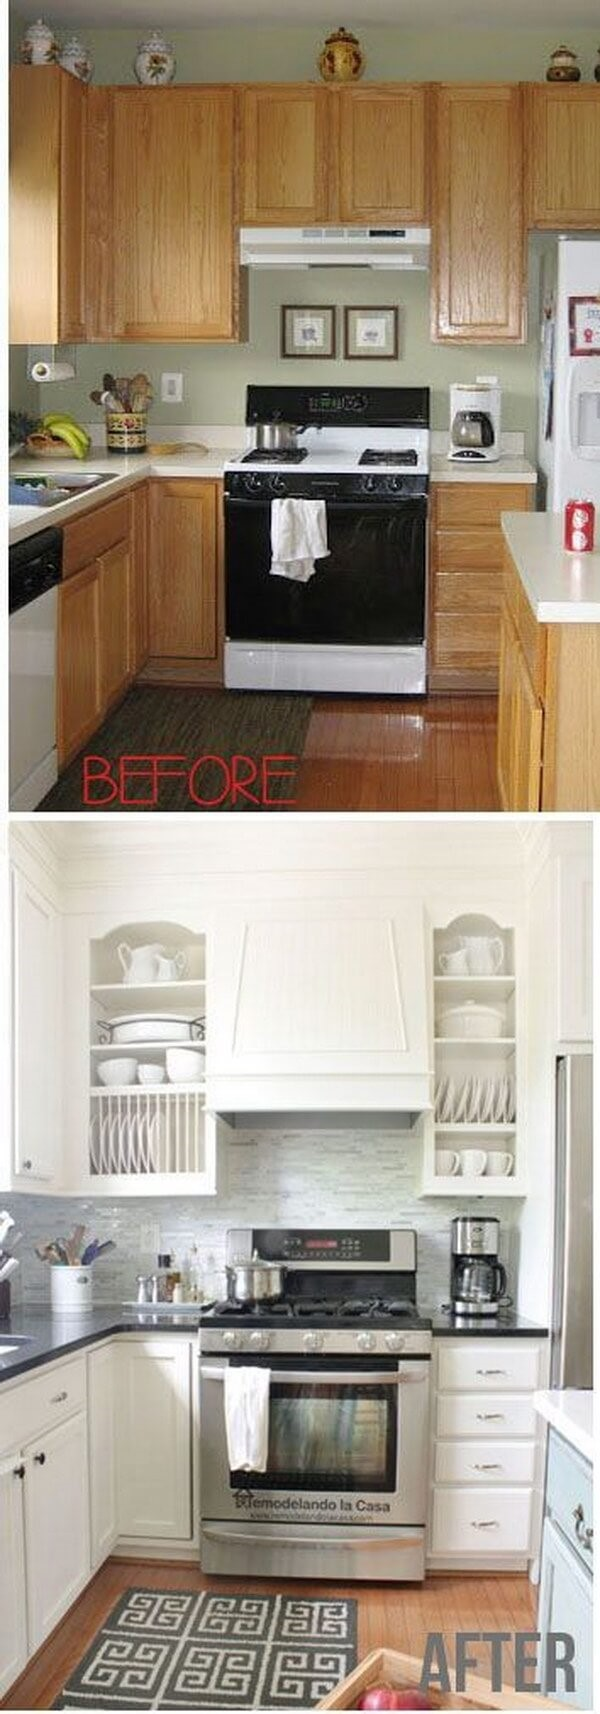 1. Remove the Cabinet Doors for a New Look via Simphome.com